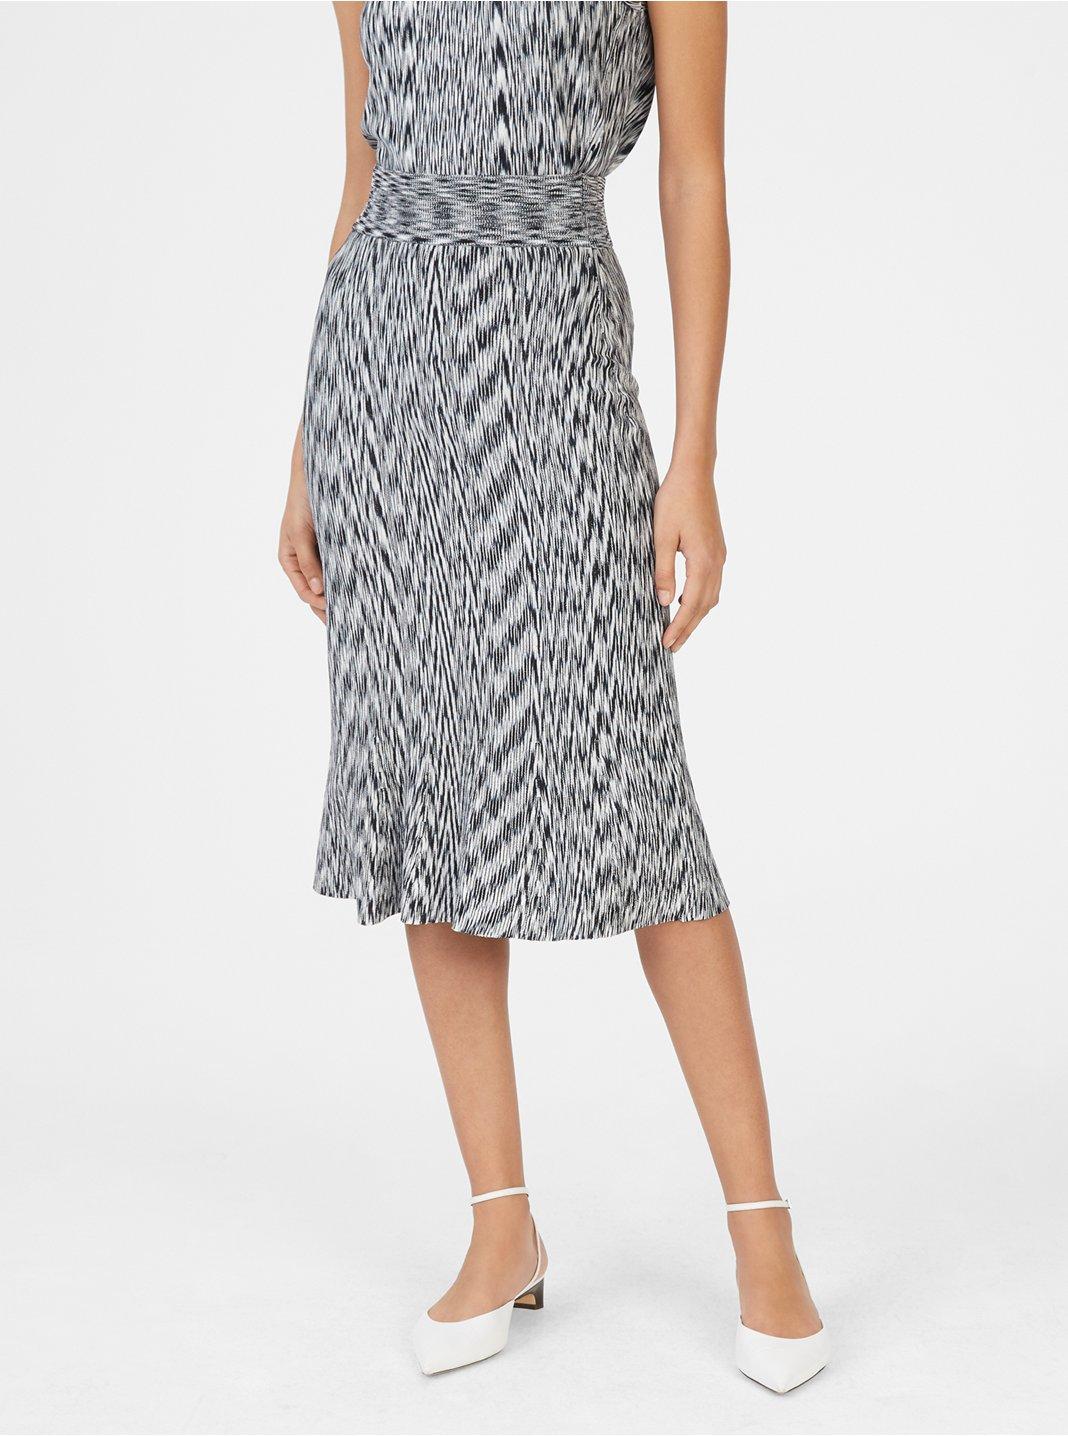 Walda Skirt